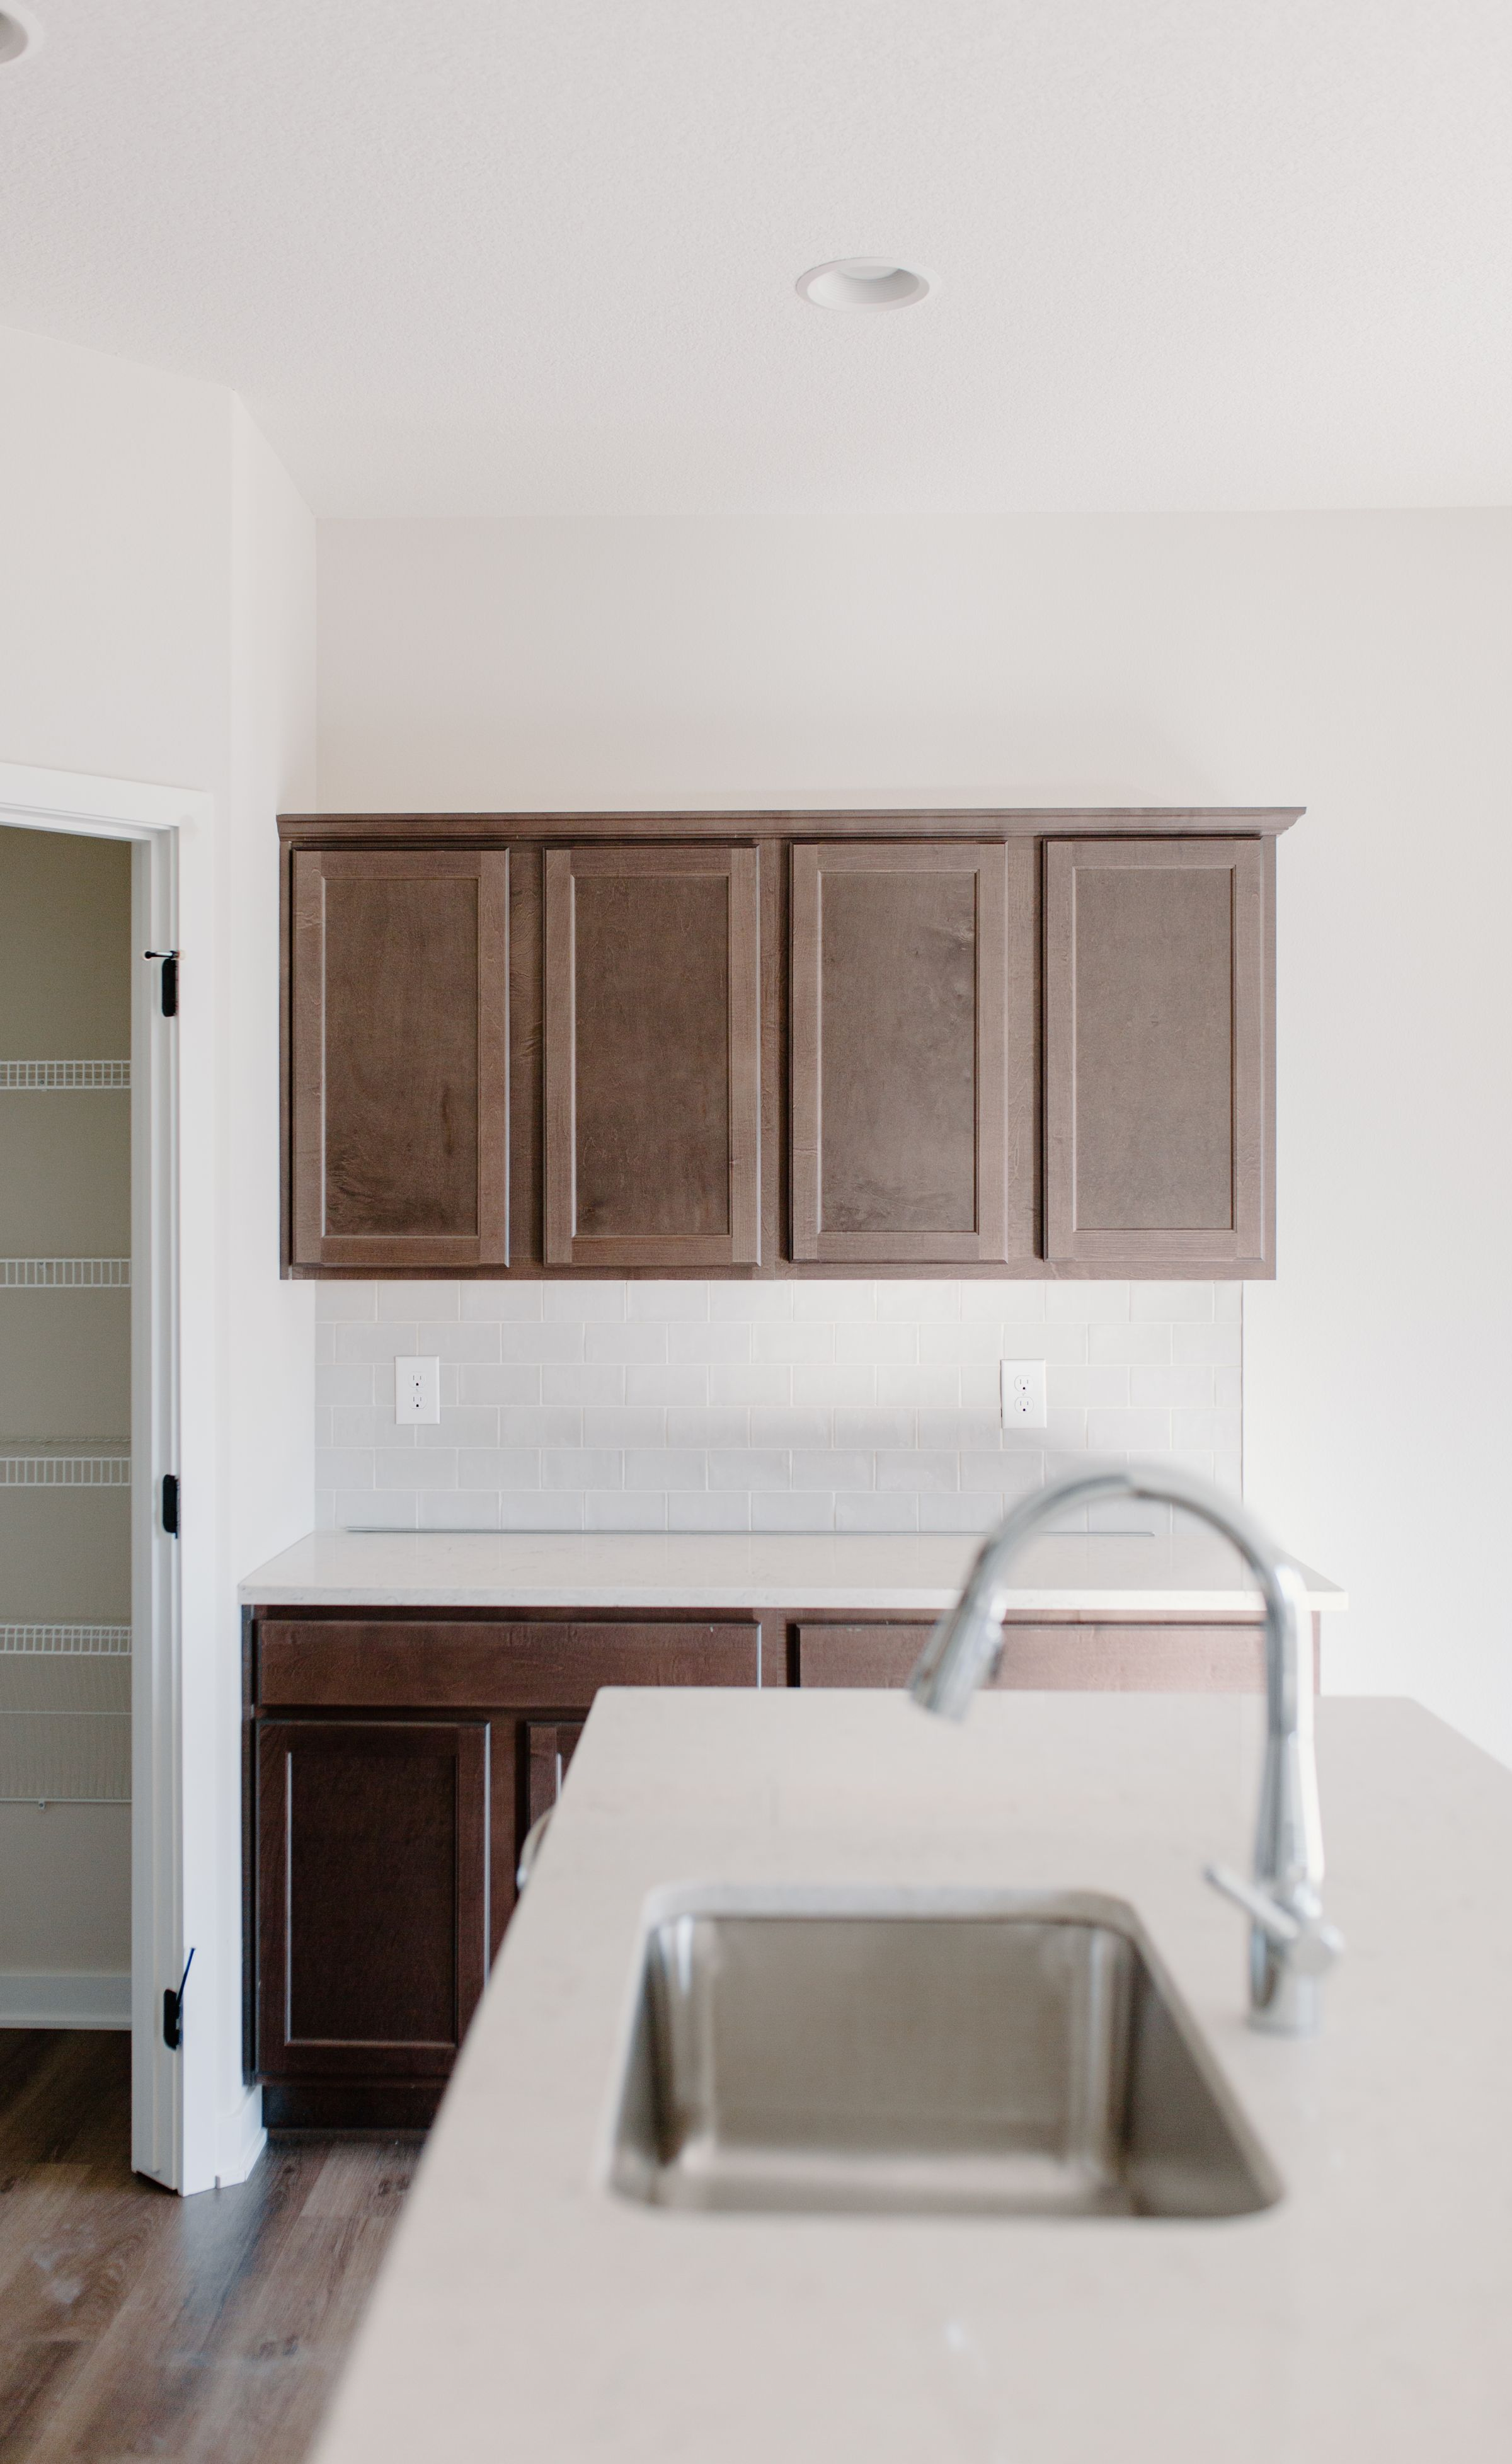 residential-warren-county-iowa-0-acres-listing-number-15140-2-2020-12-28-165450.jpg